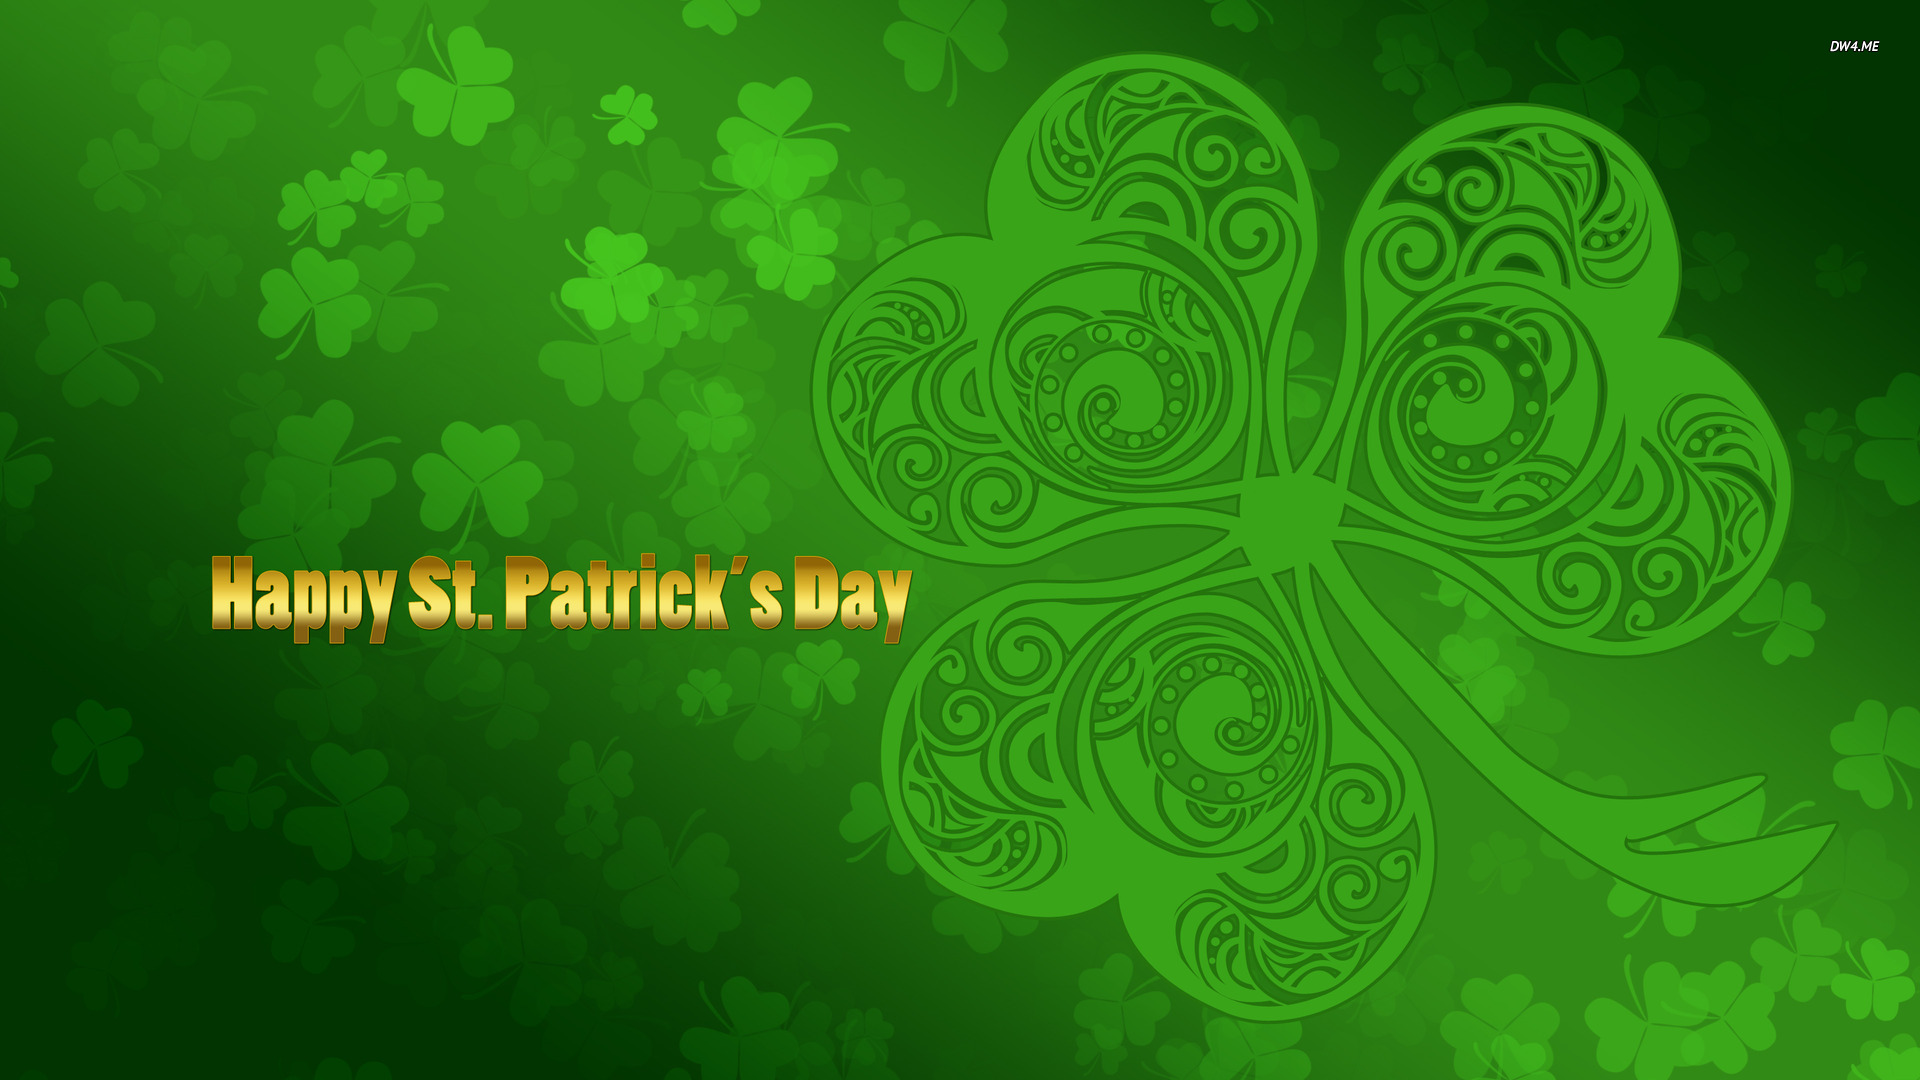 Happy Saint Patricks Day wallpaper   800350 1920x1080